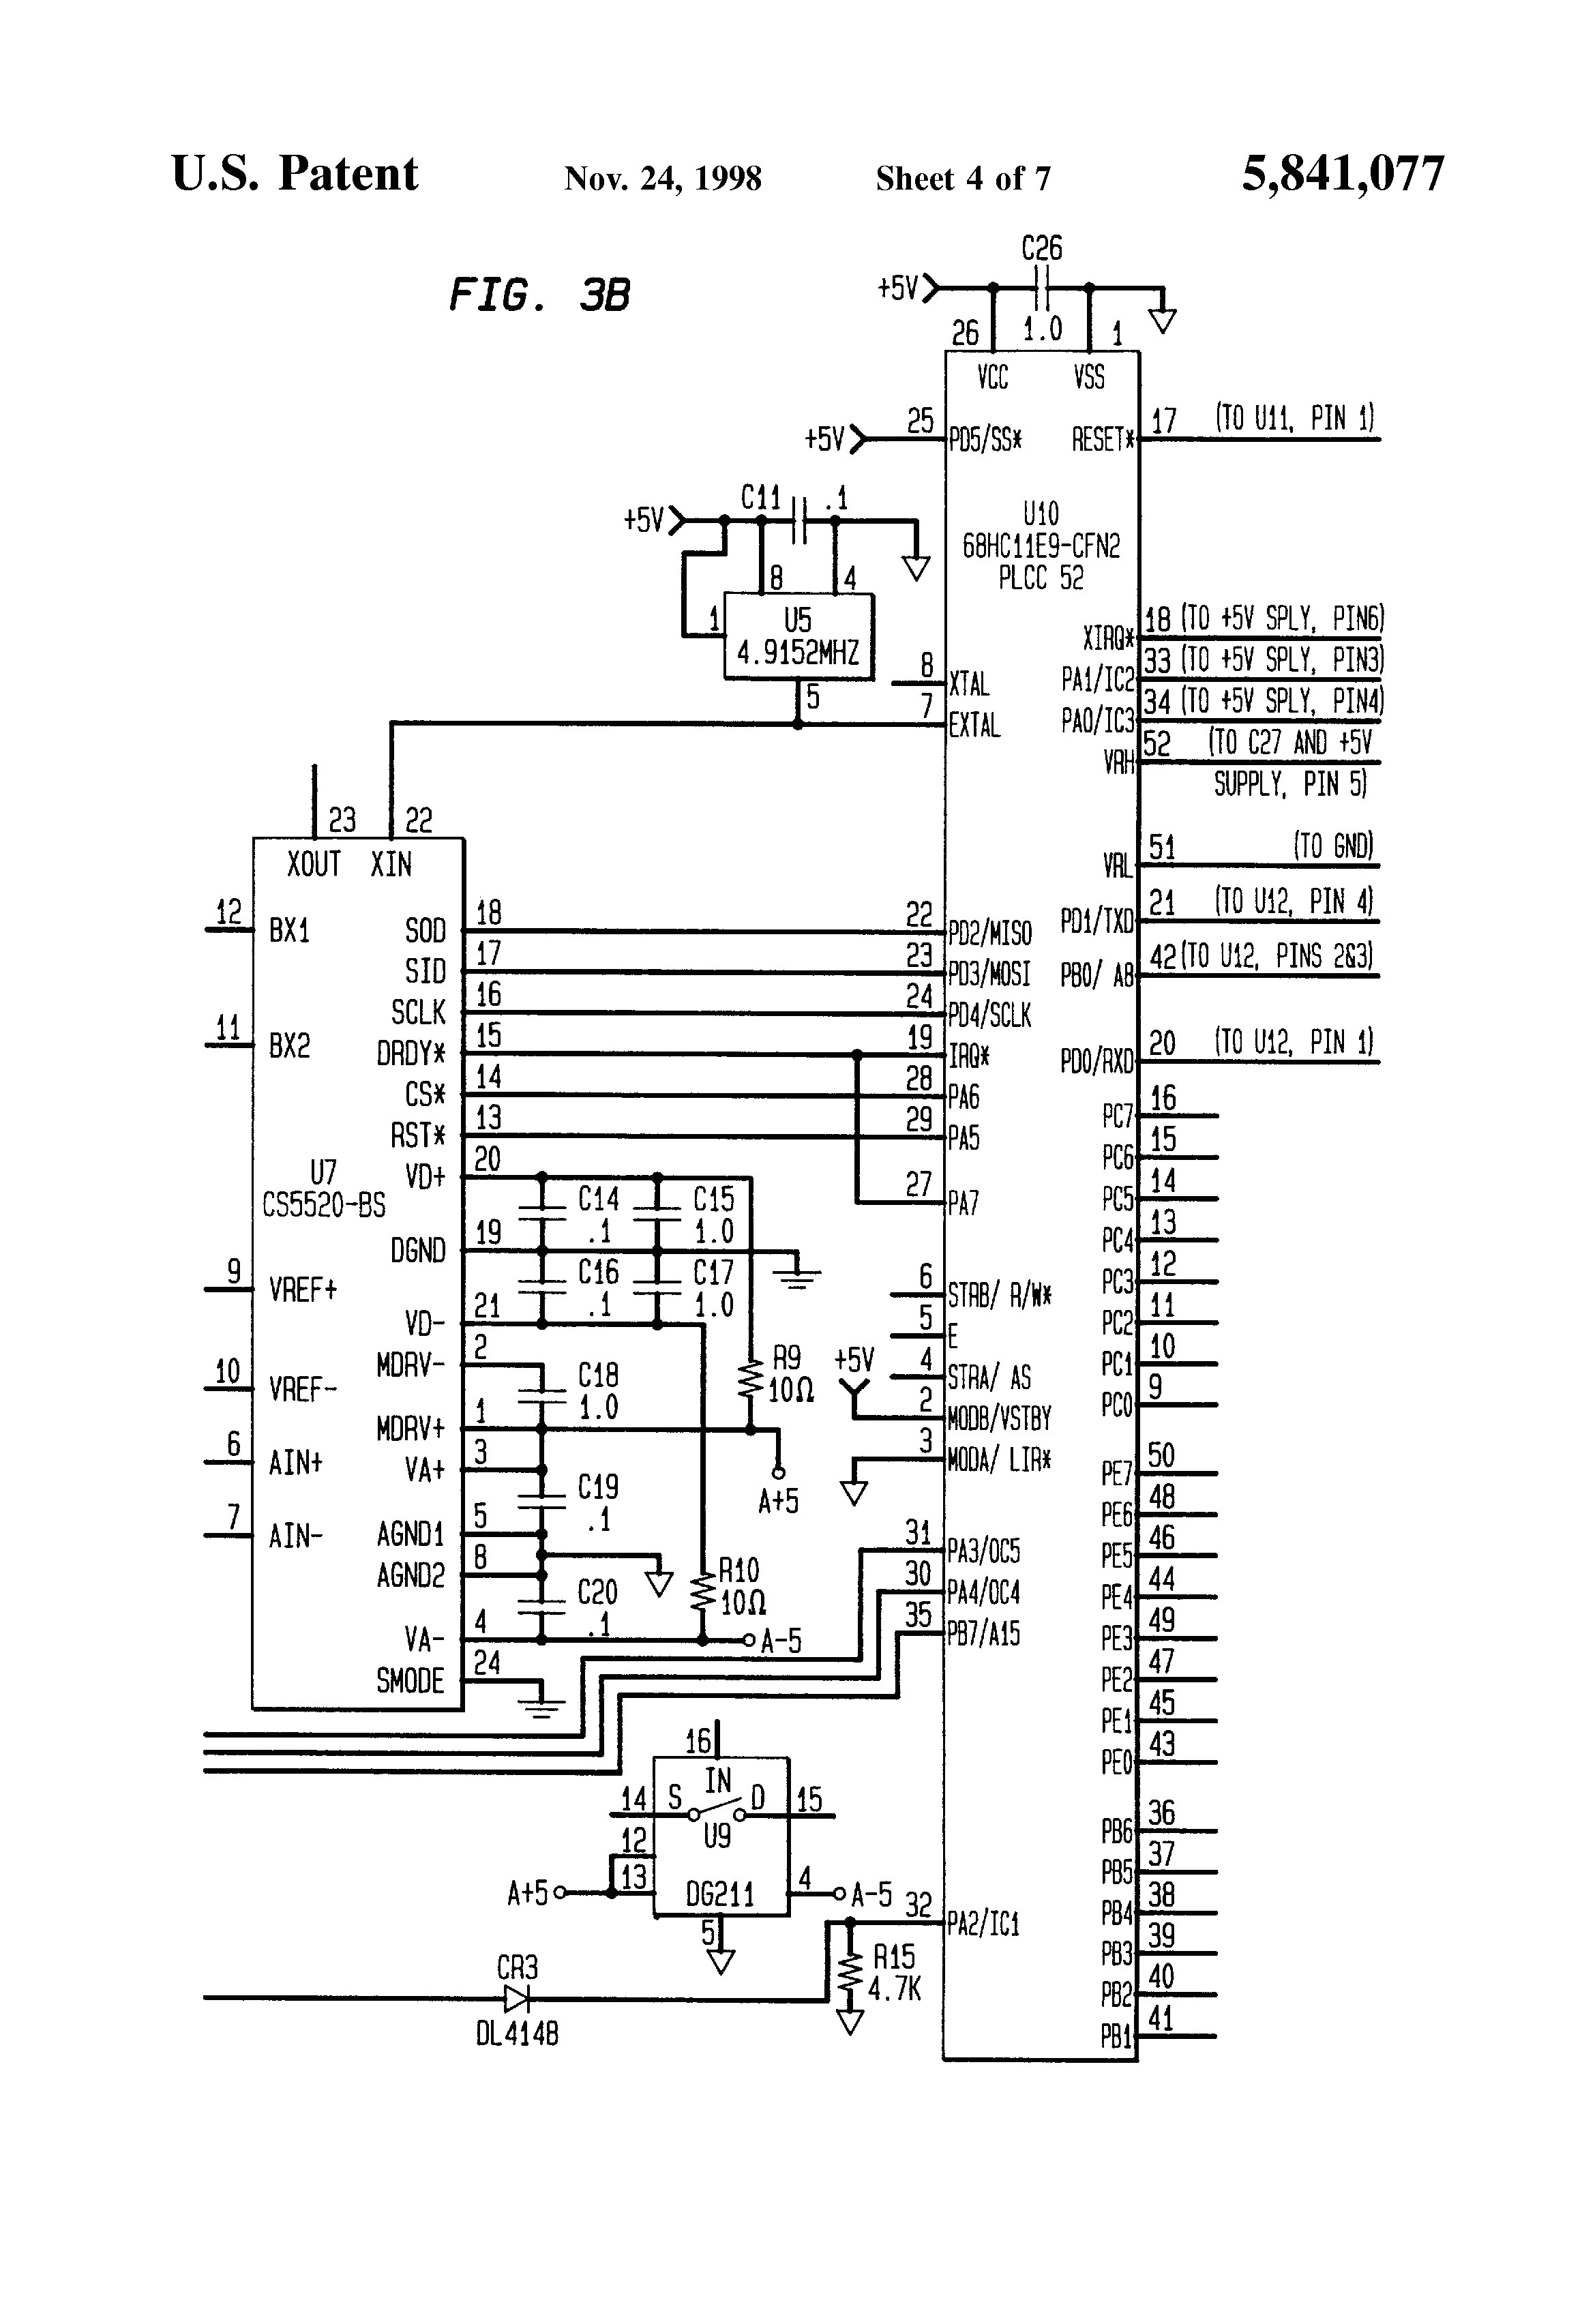 white rodgers 50e47 843 wiring diagram